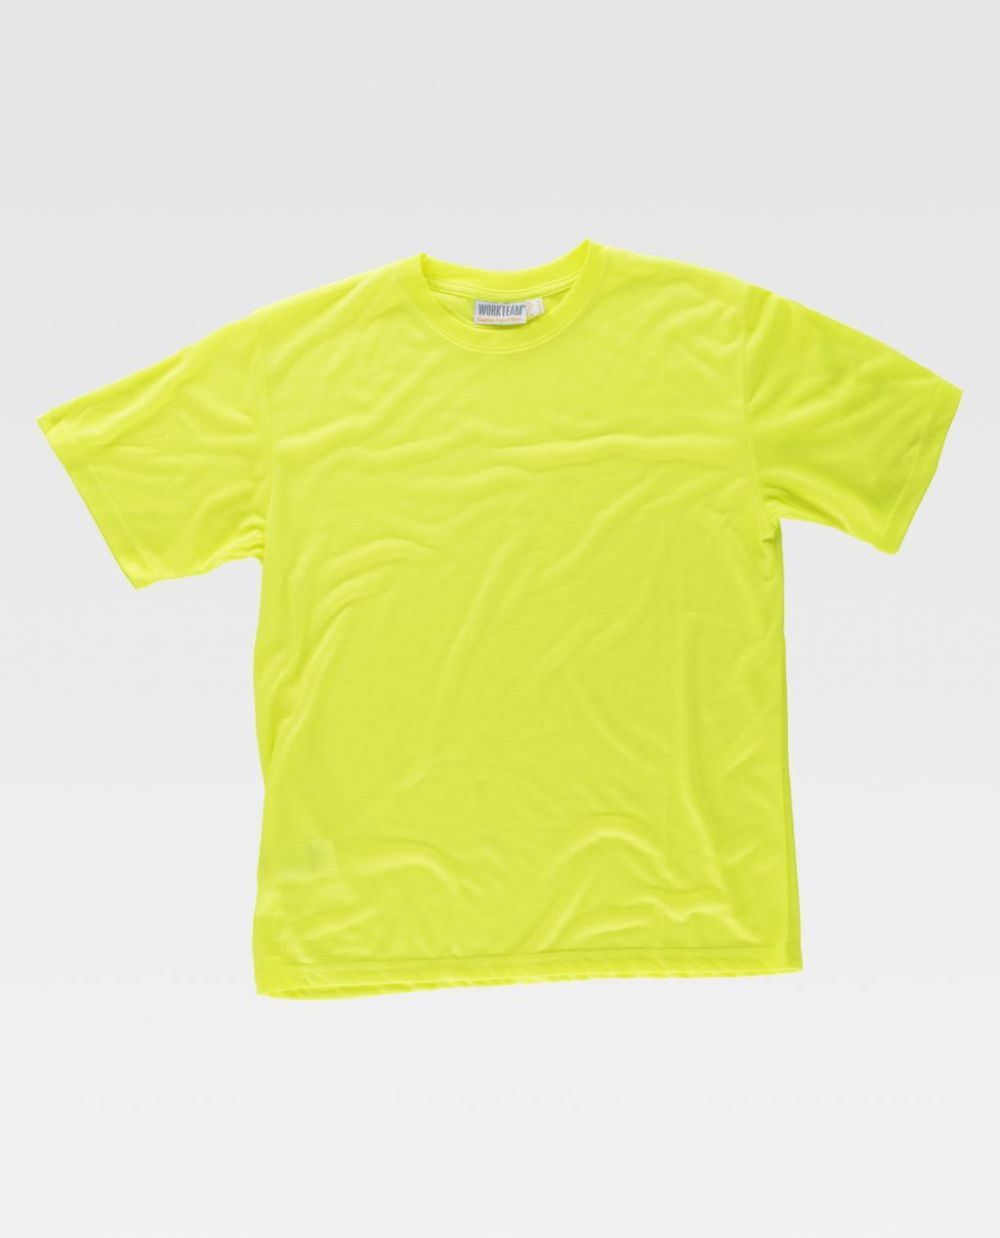 Camisetas reflectantes workteam alta visbilidad mc de poliéster para personalizar vista 1